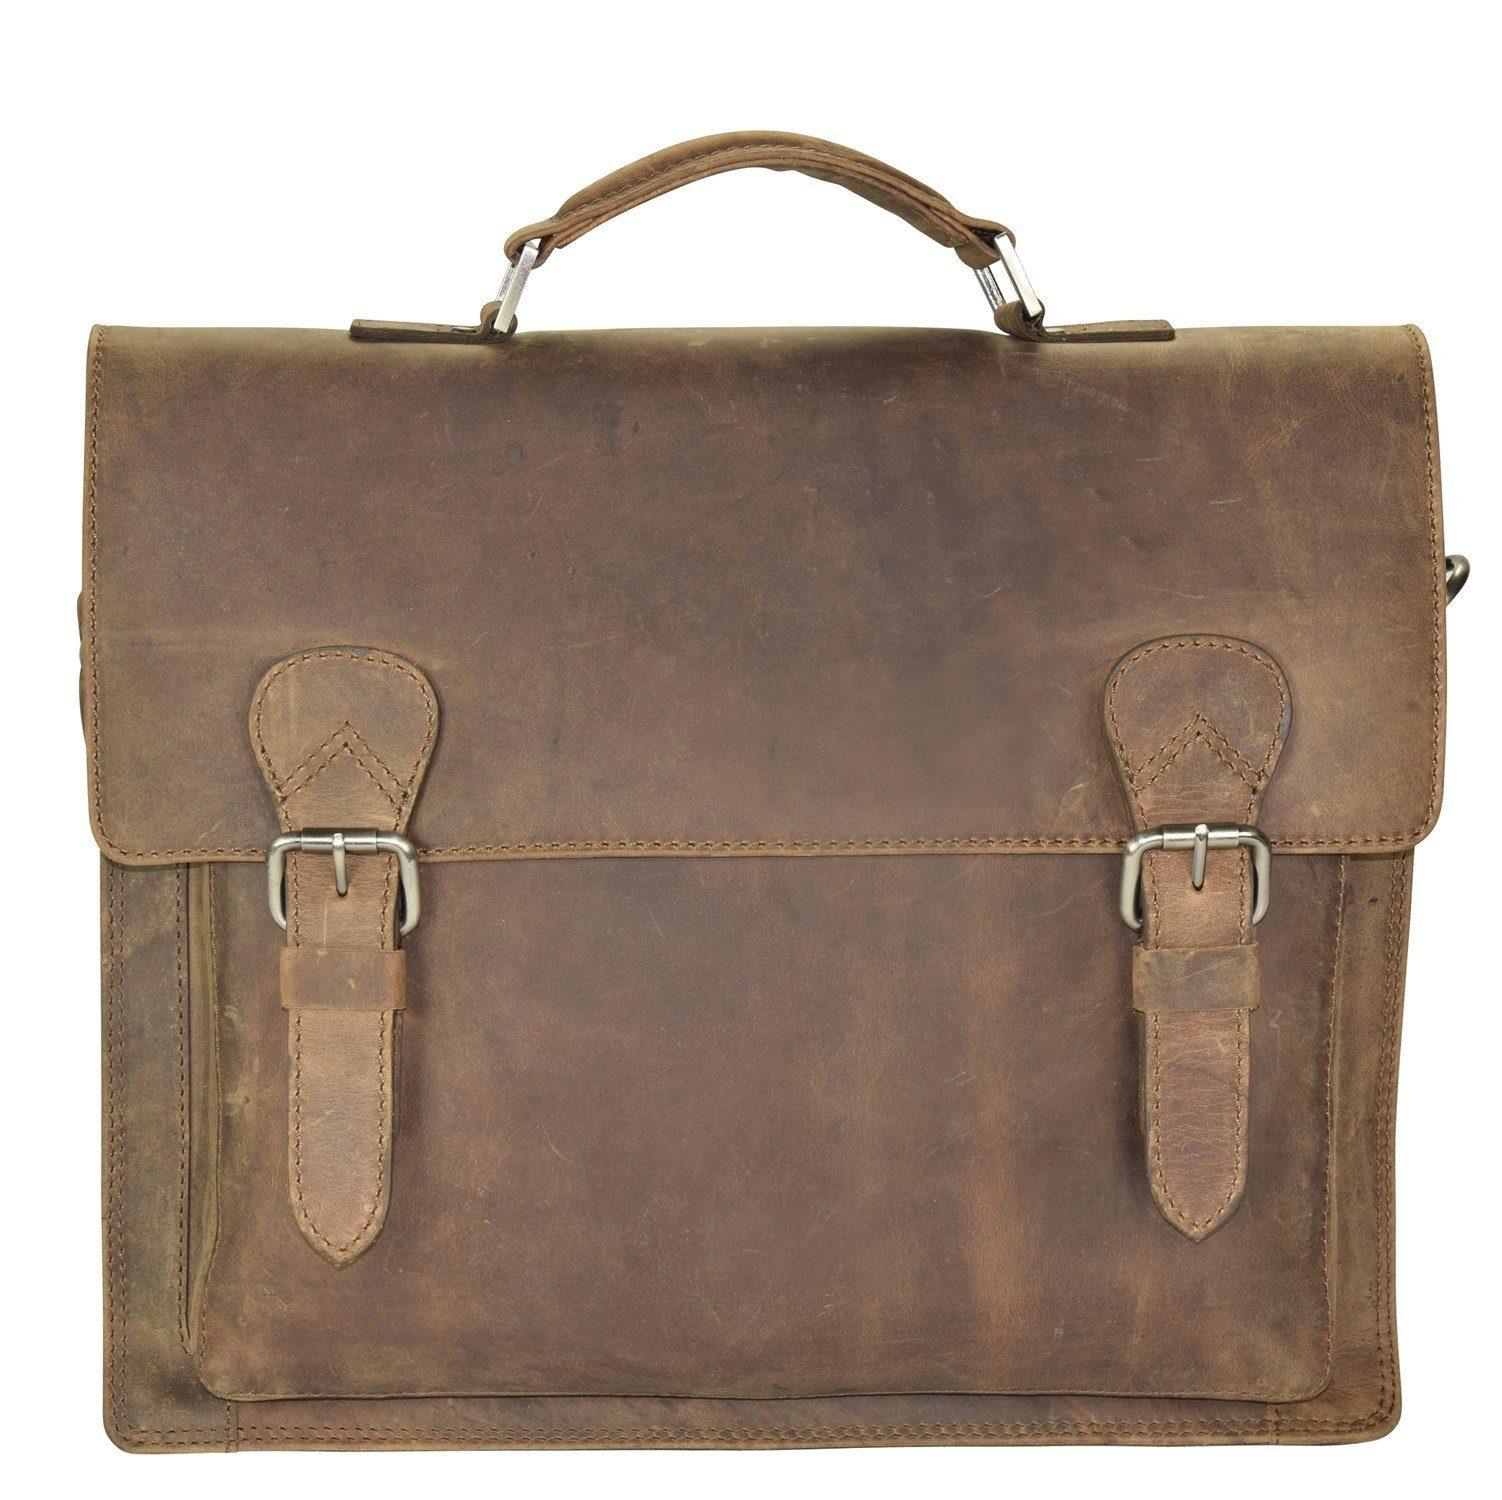 Harold's Harold's Antik Casual Aktentasche Leder 40 cm Laptopfach